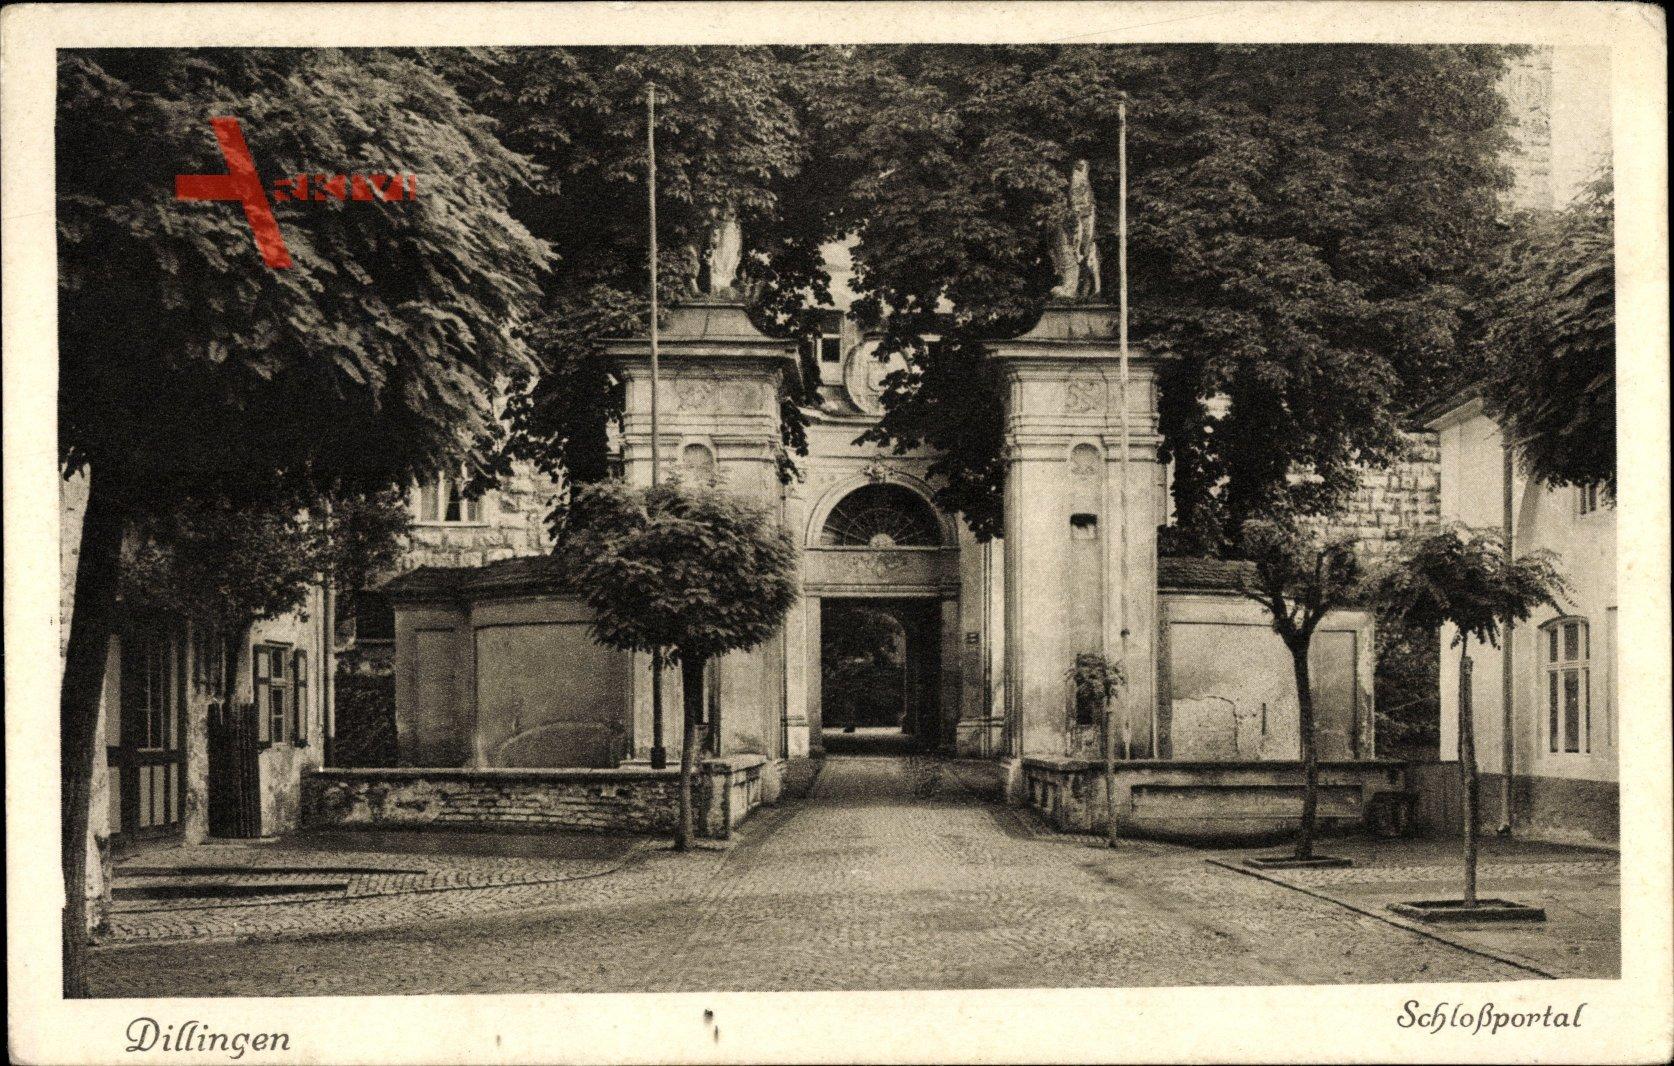 Dillingen Donau, Blick auf das Schlossportal, Eingangstor